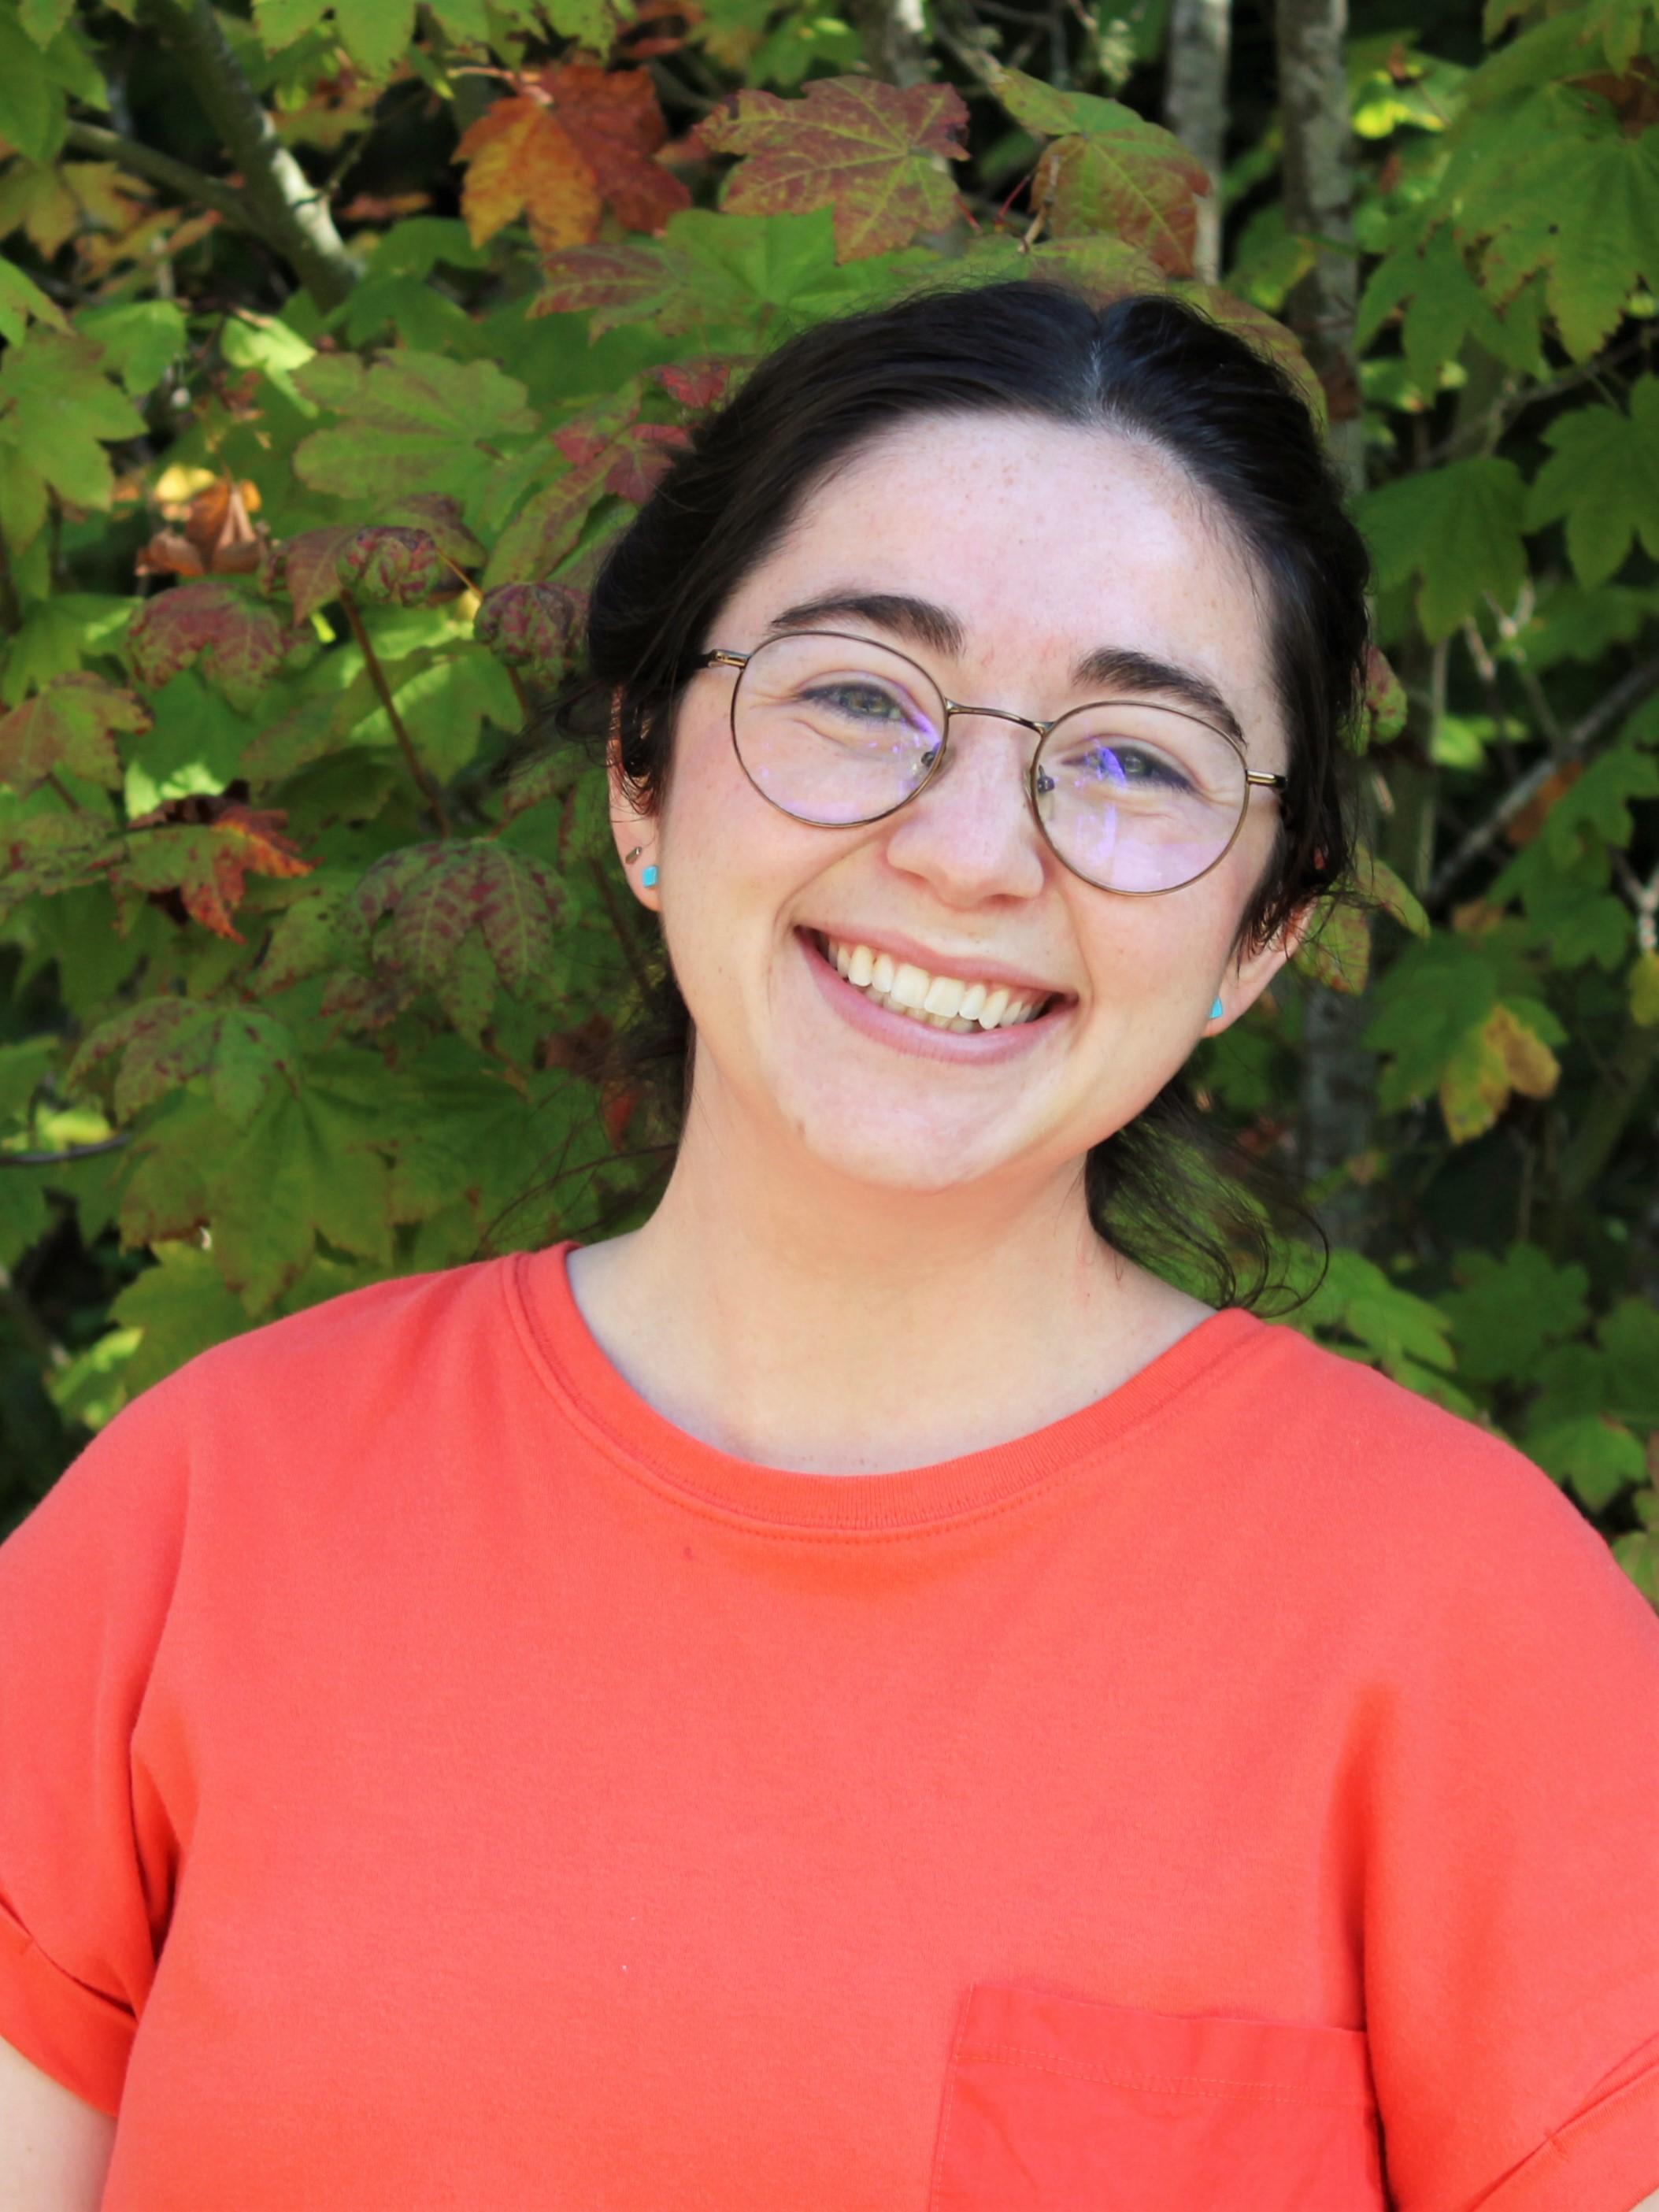 IslandWood Graduate Program student Grace Merrett